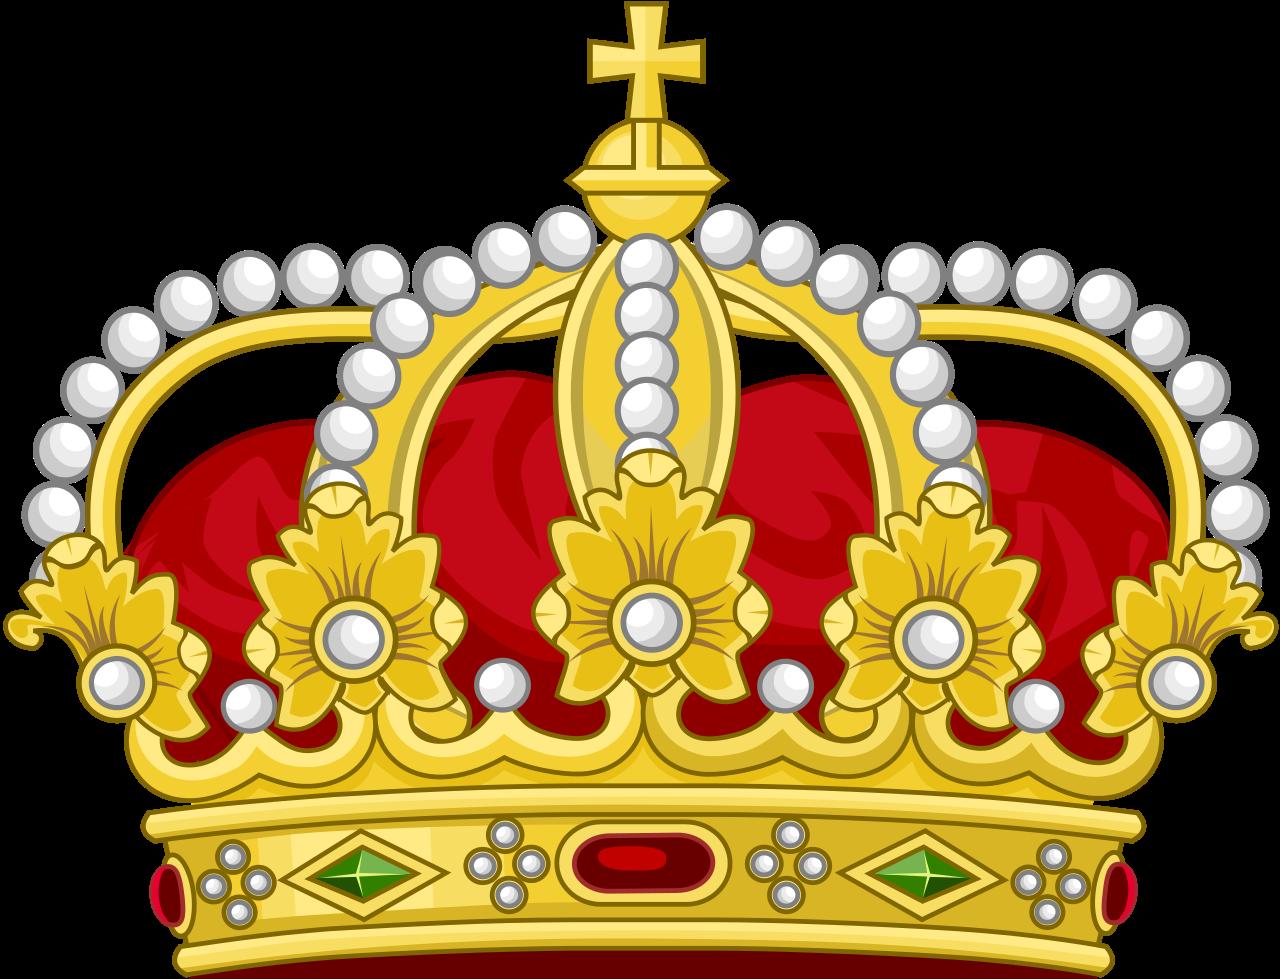 King clipart roman king. File heraldic royal crown